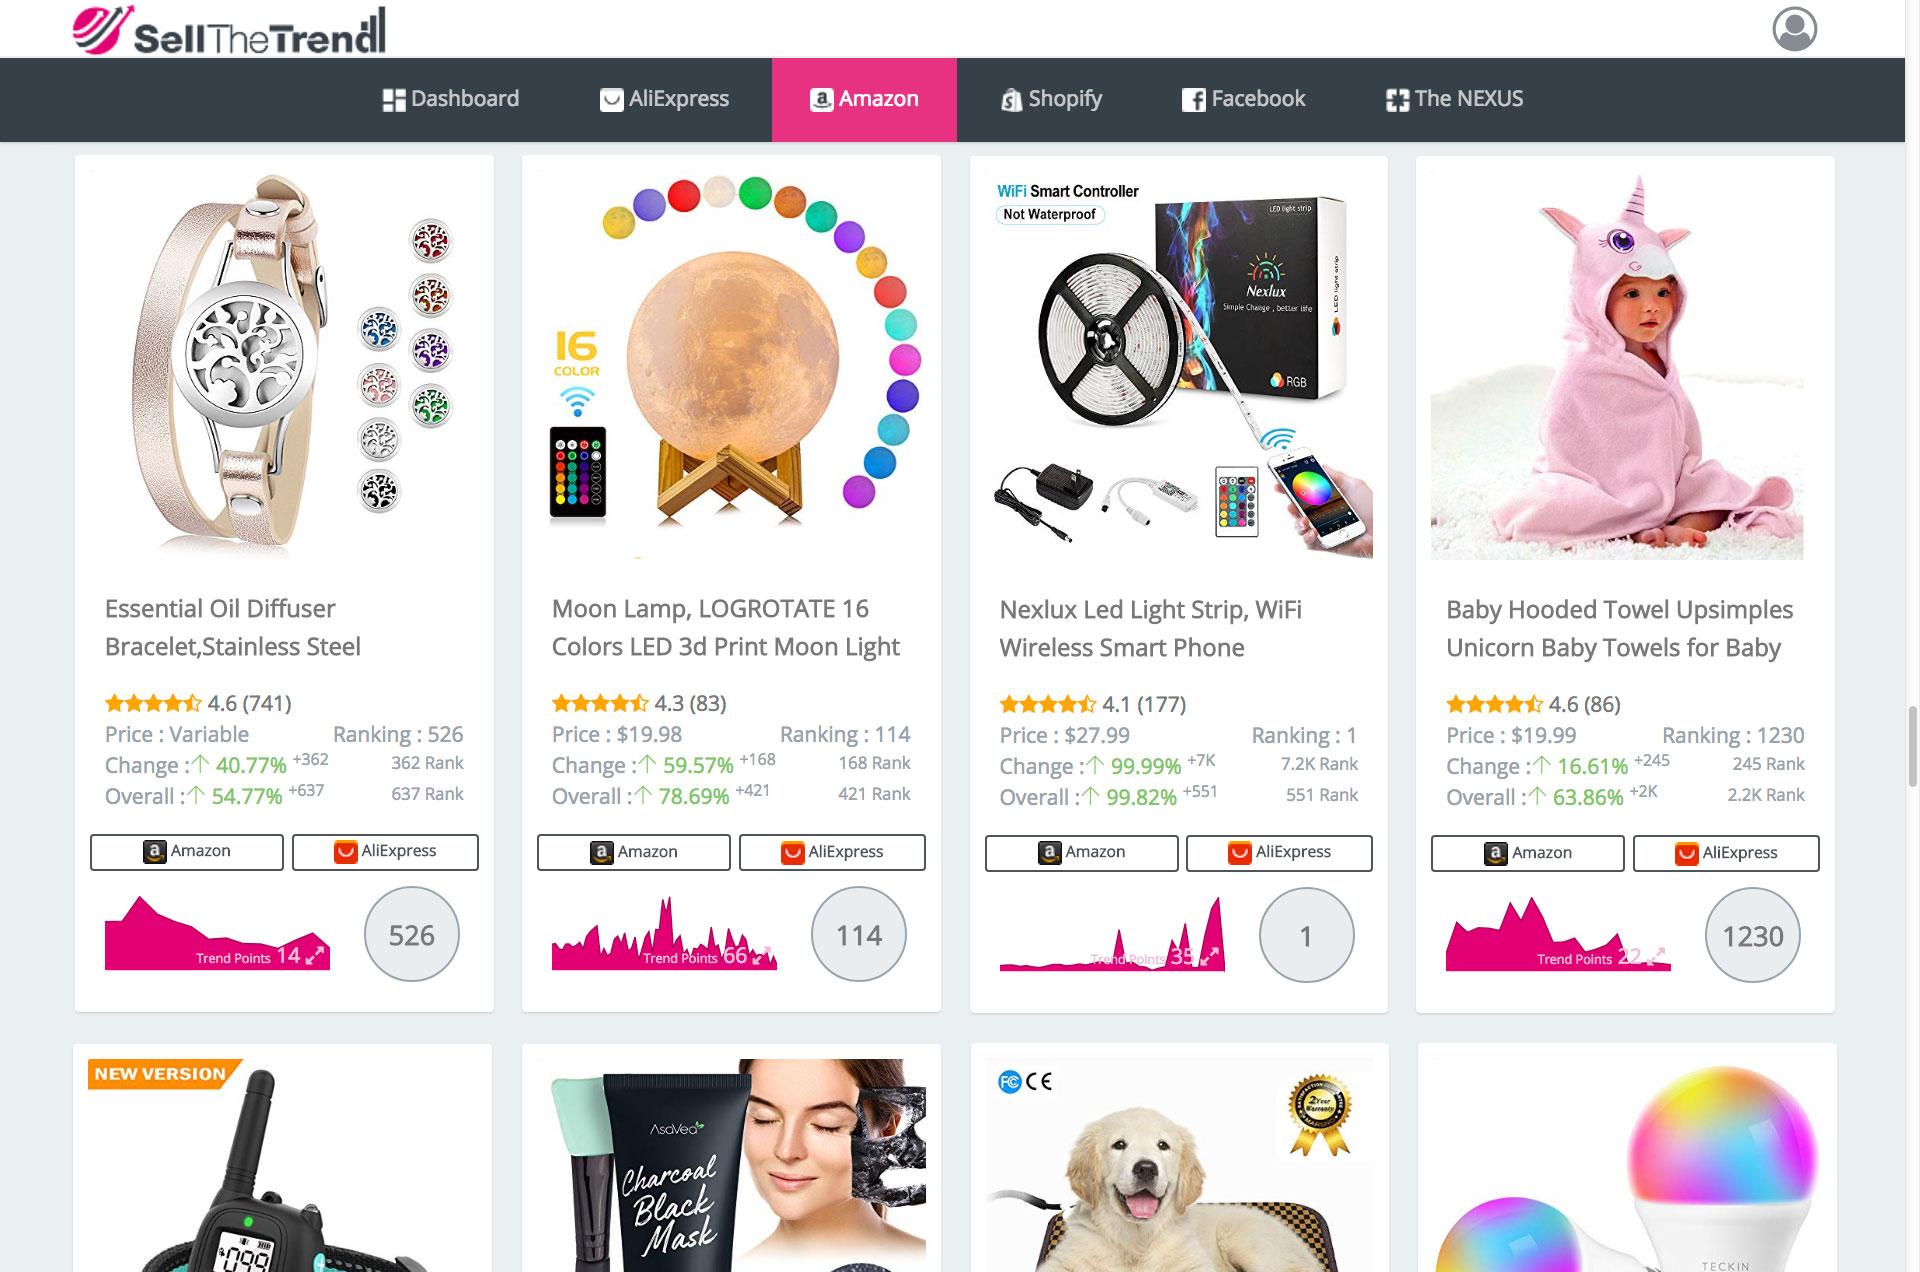 Sell The Trend's Amazon explorer